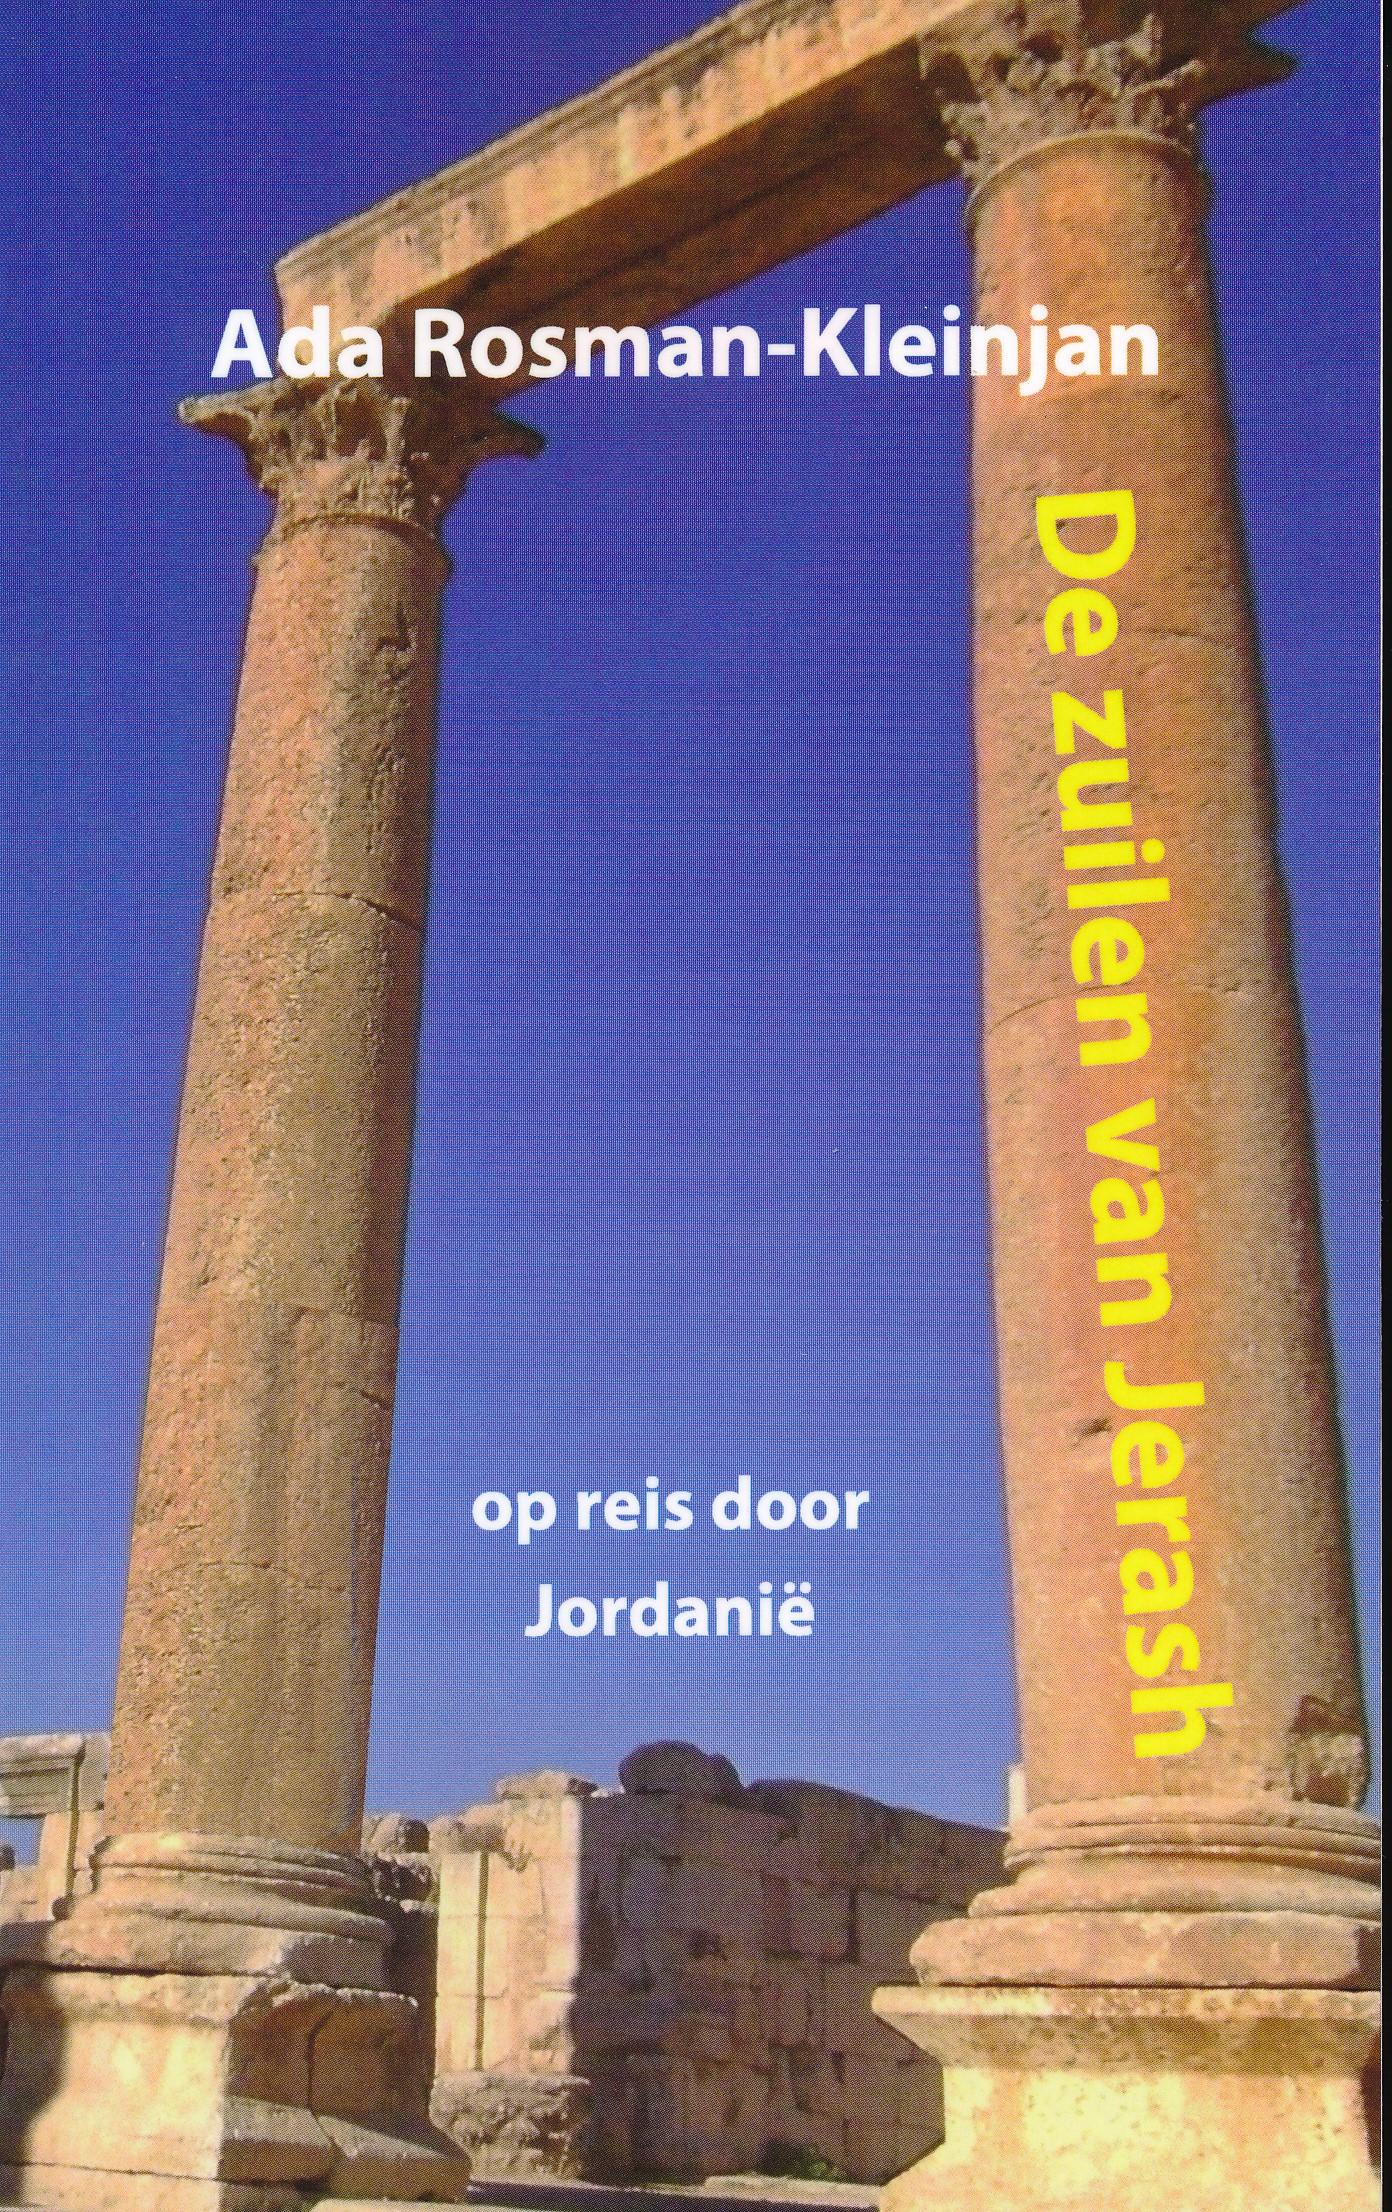 Reisverhaal De zuilen van Jerash - Jordanië | Ada Rosman <br/>€ 10.00 <br/> <a href='https://www.dezwerver.nl/reisgidsen/?tt=1554_252853_241358_&r=https%3A%2F%2Fwww.dezwerver.nl%2Fr%2Fmidden-oosten%2Fjordanie%2Fc%2Fboeken%2Freisverhalen%2F9783752889062%2Freisverhaal-de-zuilen-van-jerash-jordanie-ada-rosman%2F' target='_blank'>Meer Info</a>